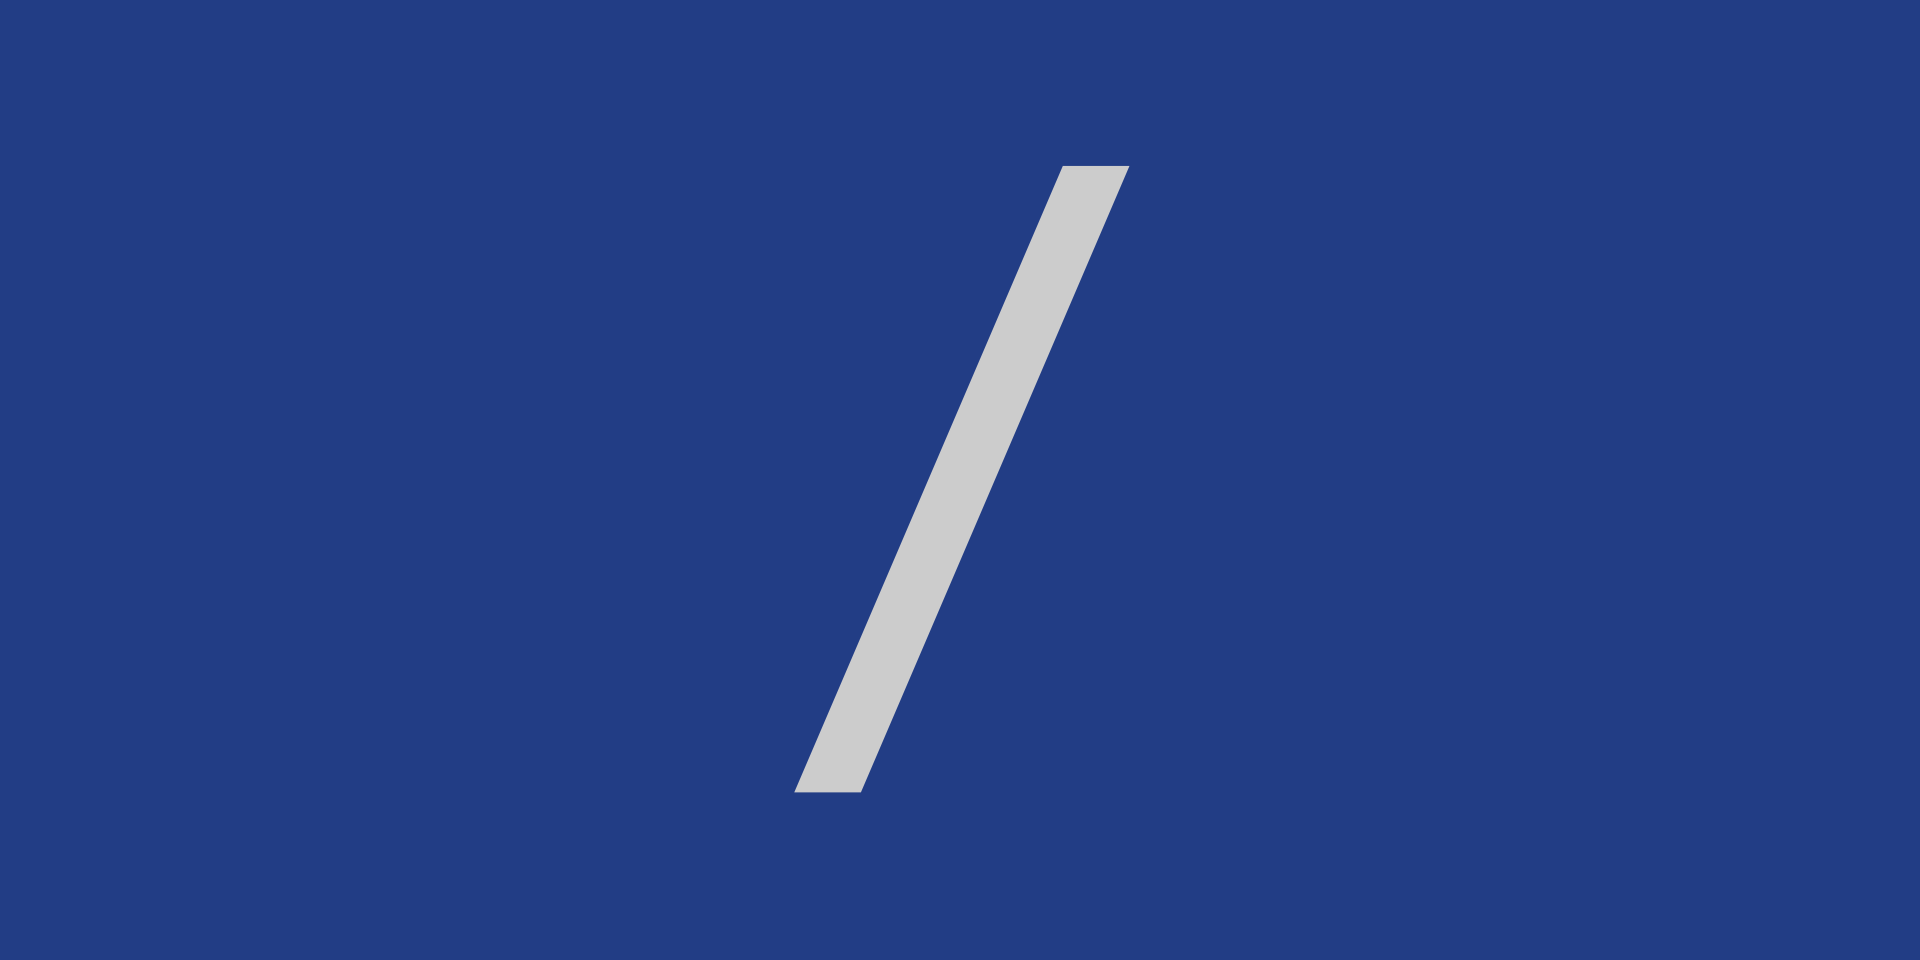 1920x960 .autogrado.